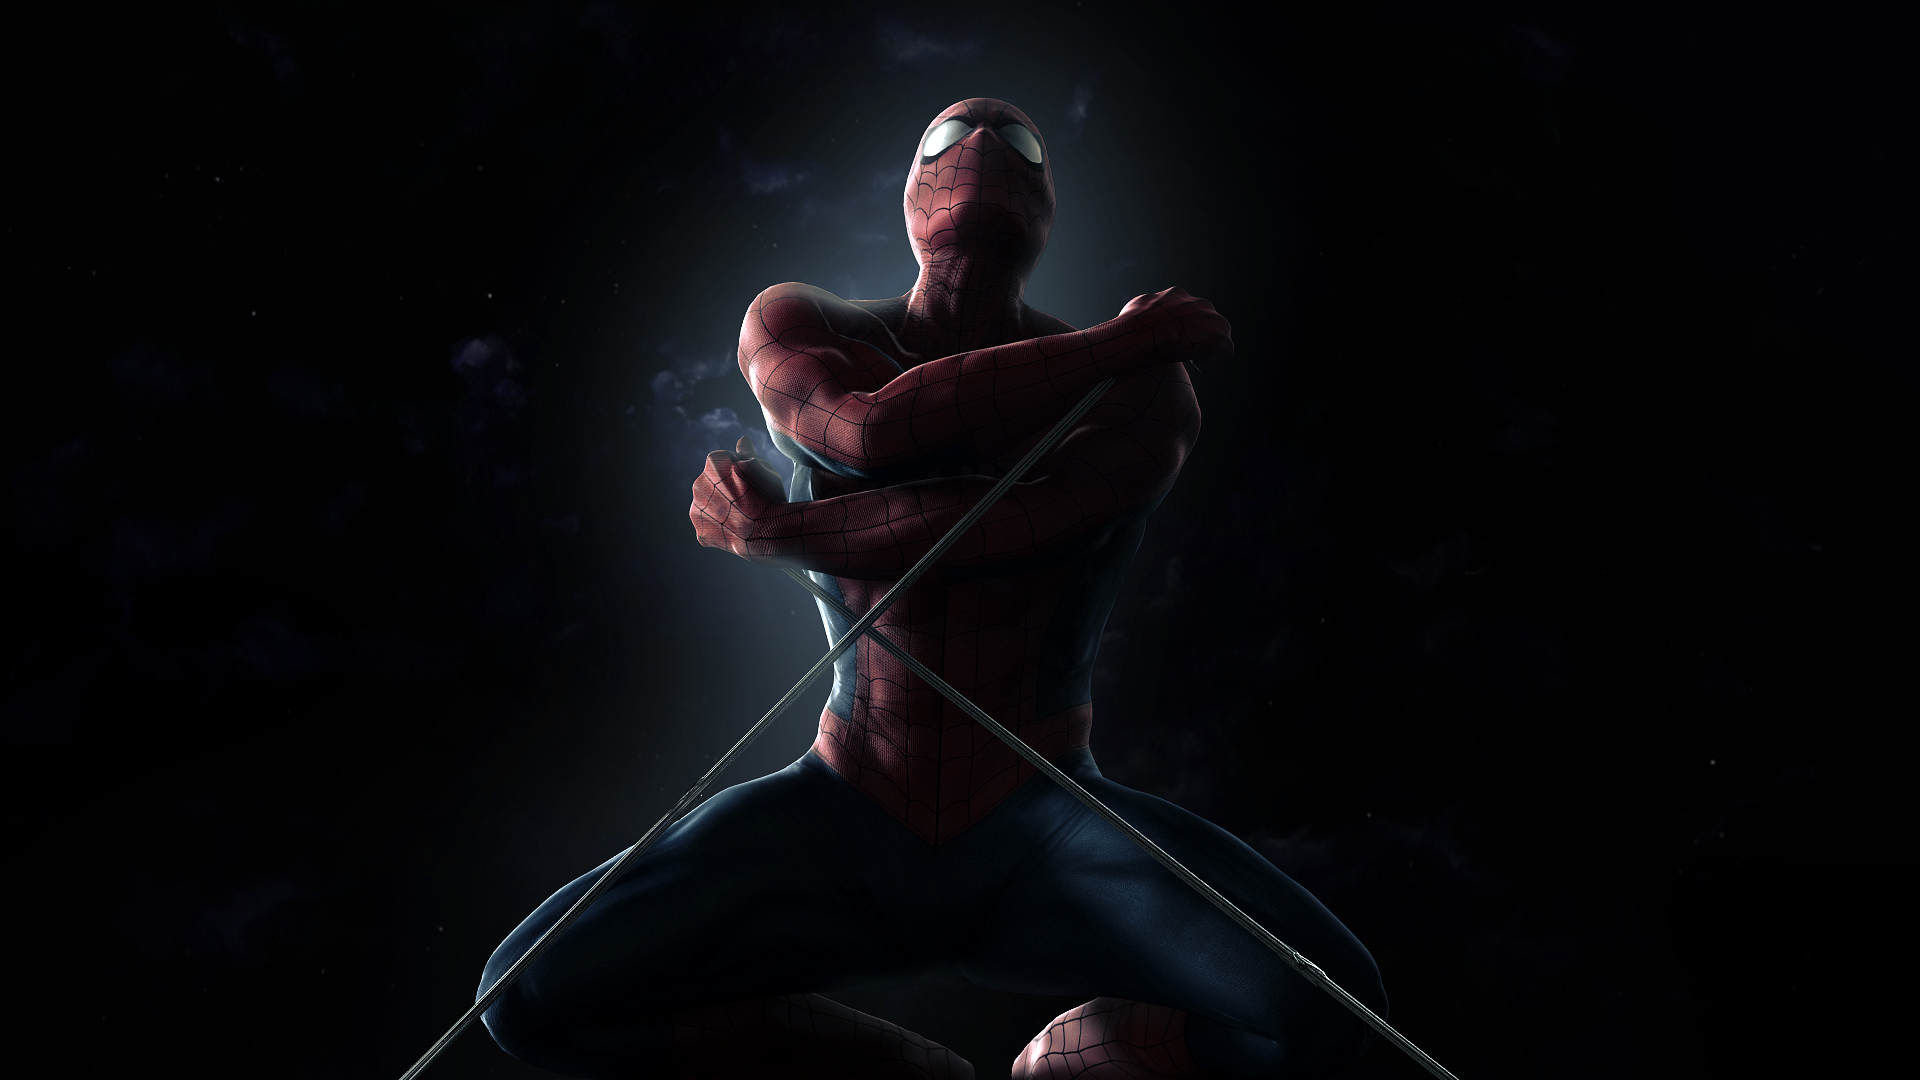 Spiderman 3D Wallpaper   Widescreen HD Wallpapers 1920x1080